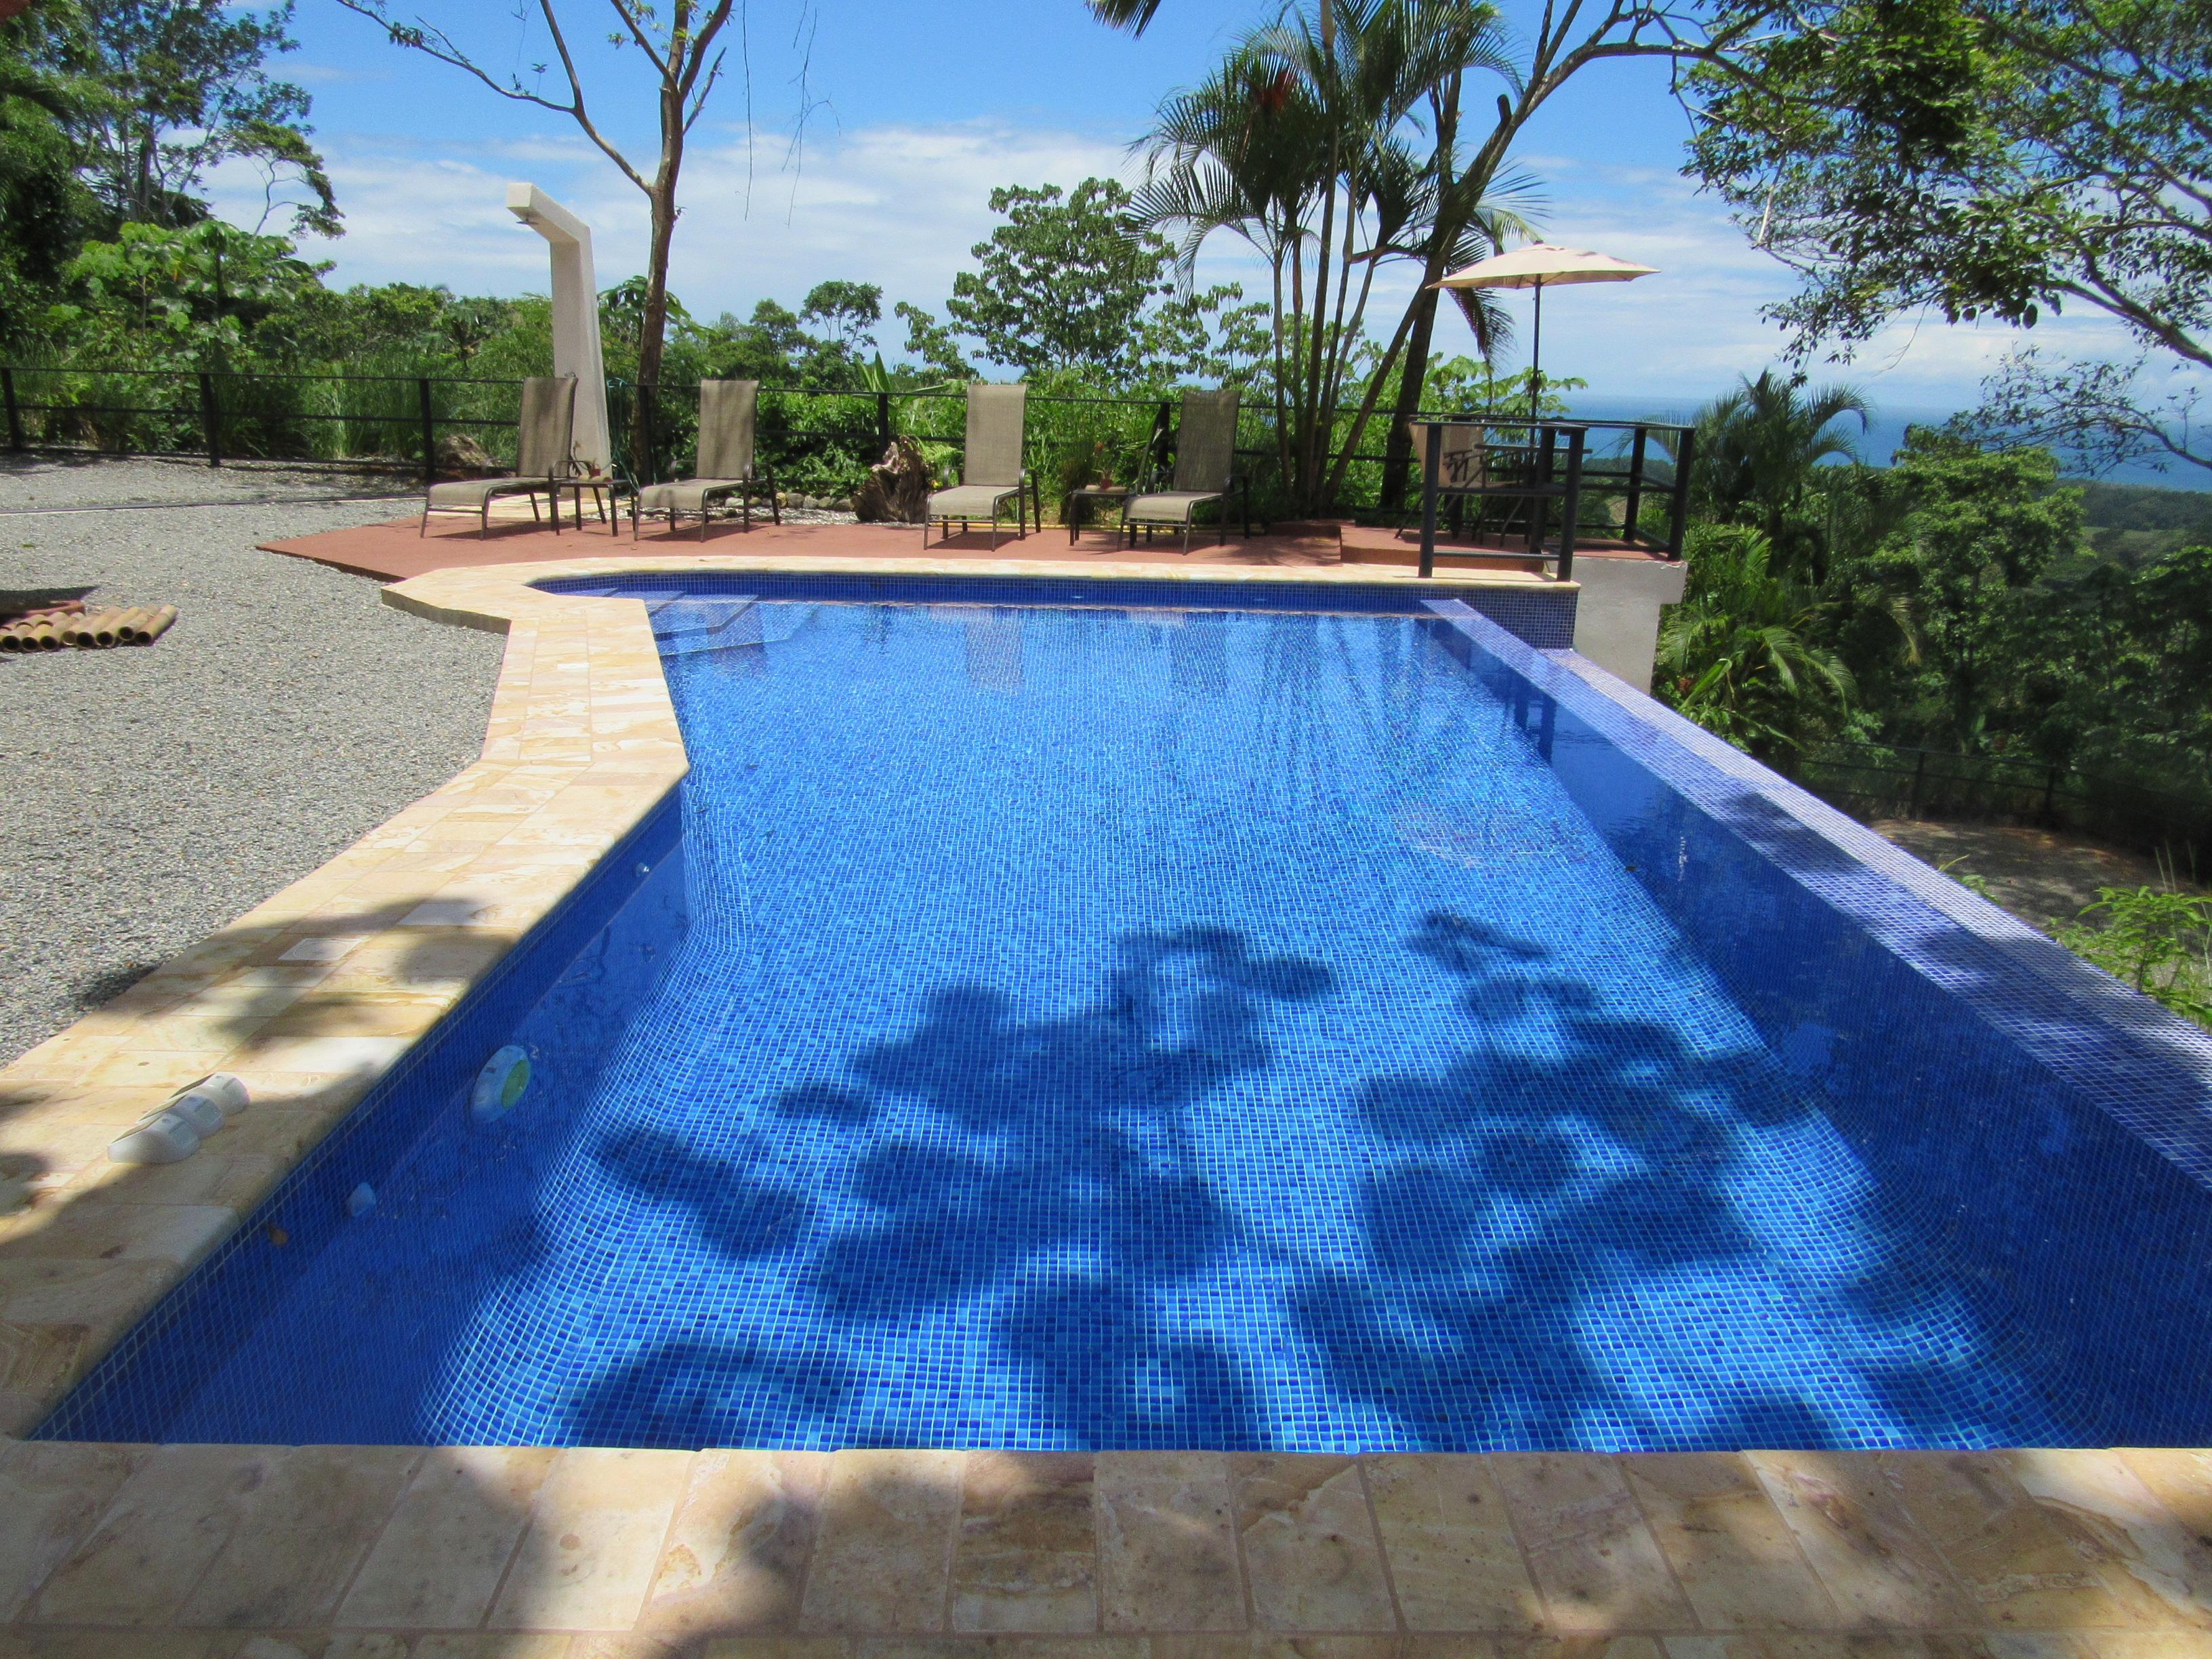 Hatillo-Costa-Rica-property-costaricarealestateHAT087-4.jpg